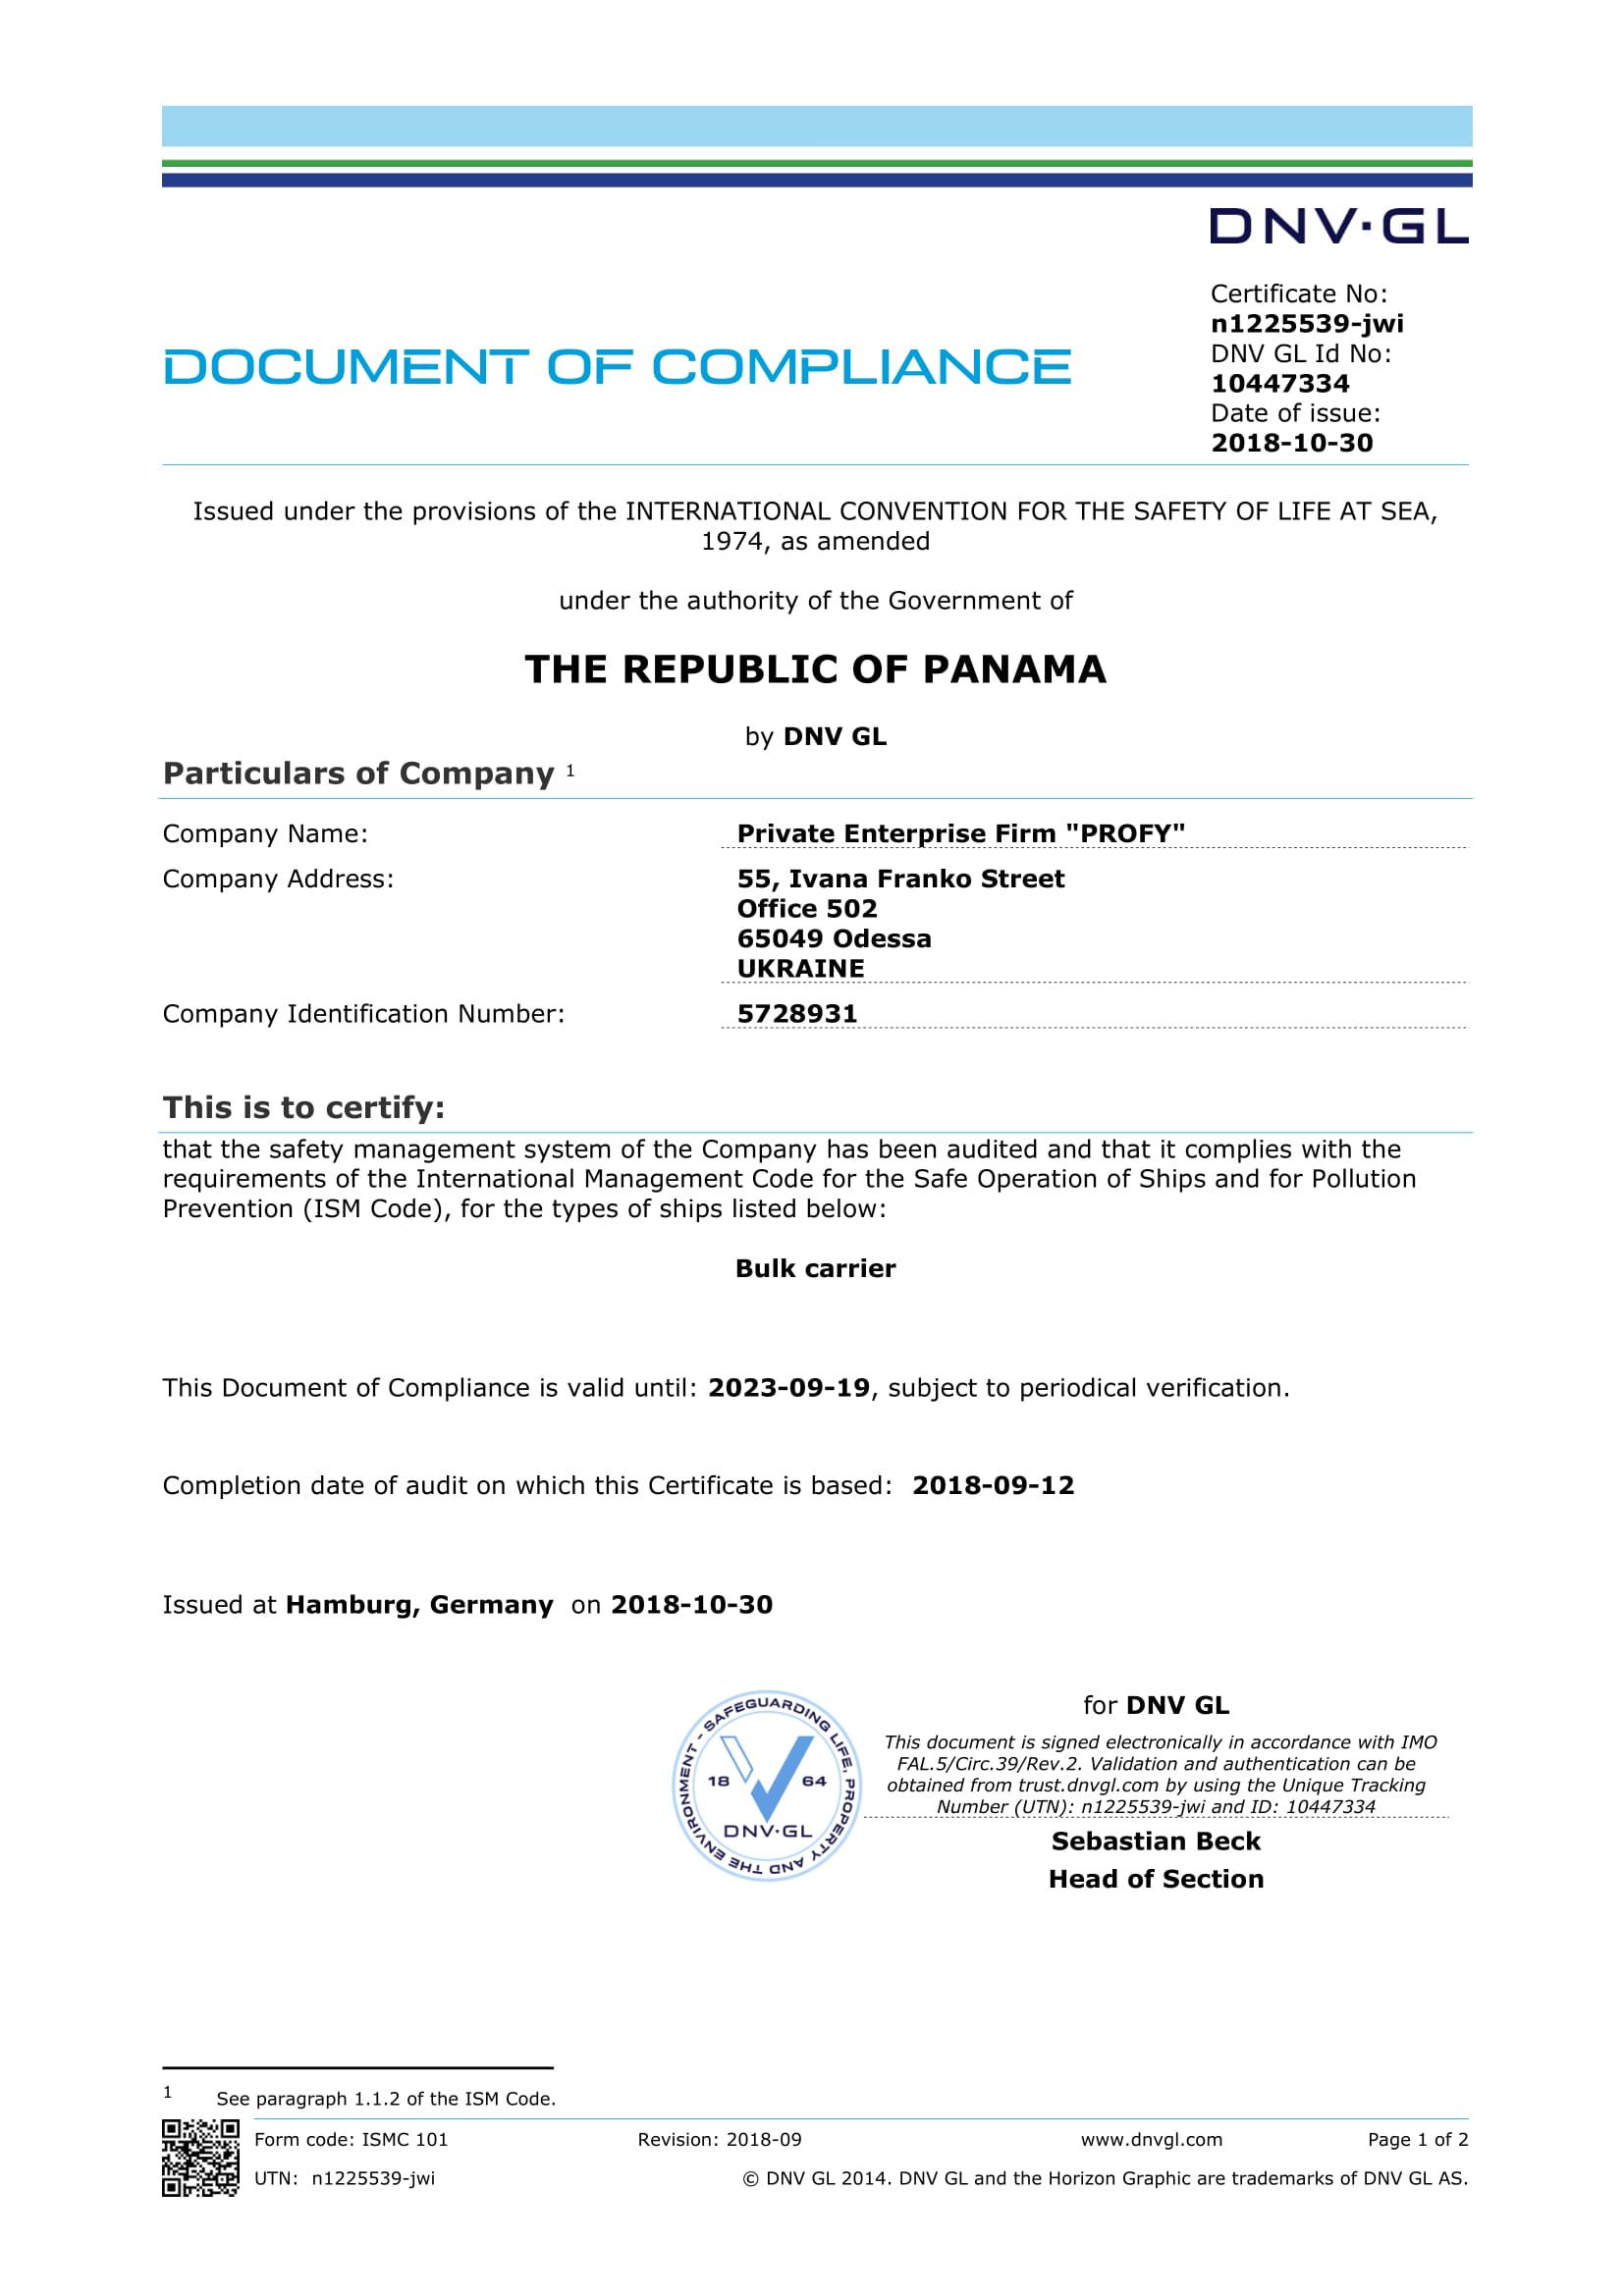 2018.10.30 PANAMA DOC-1